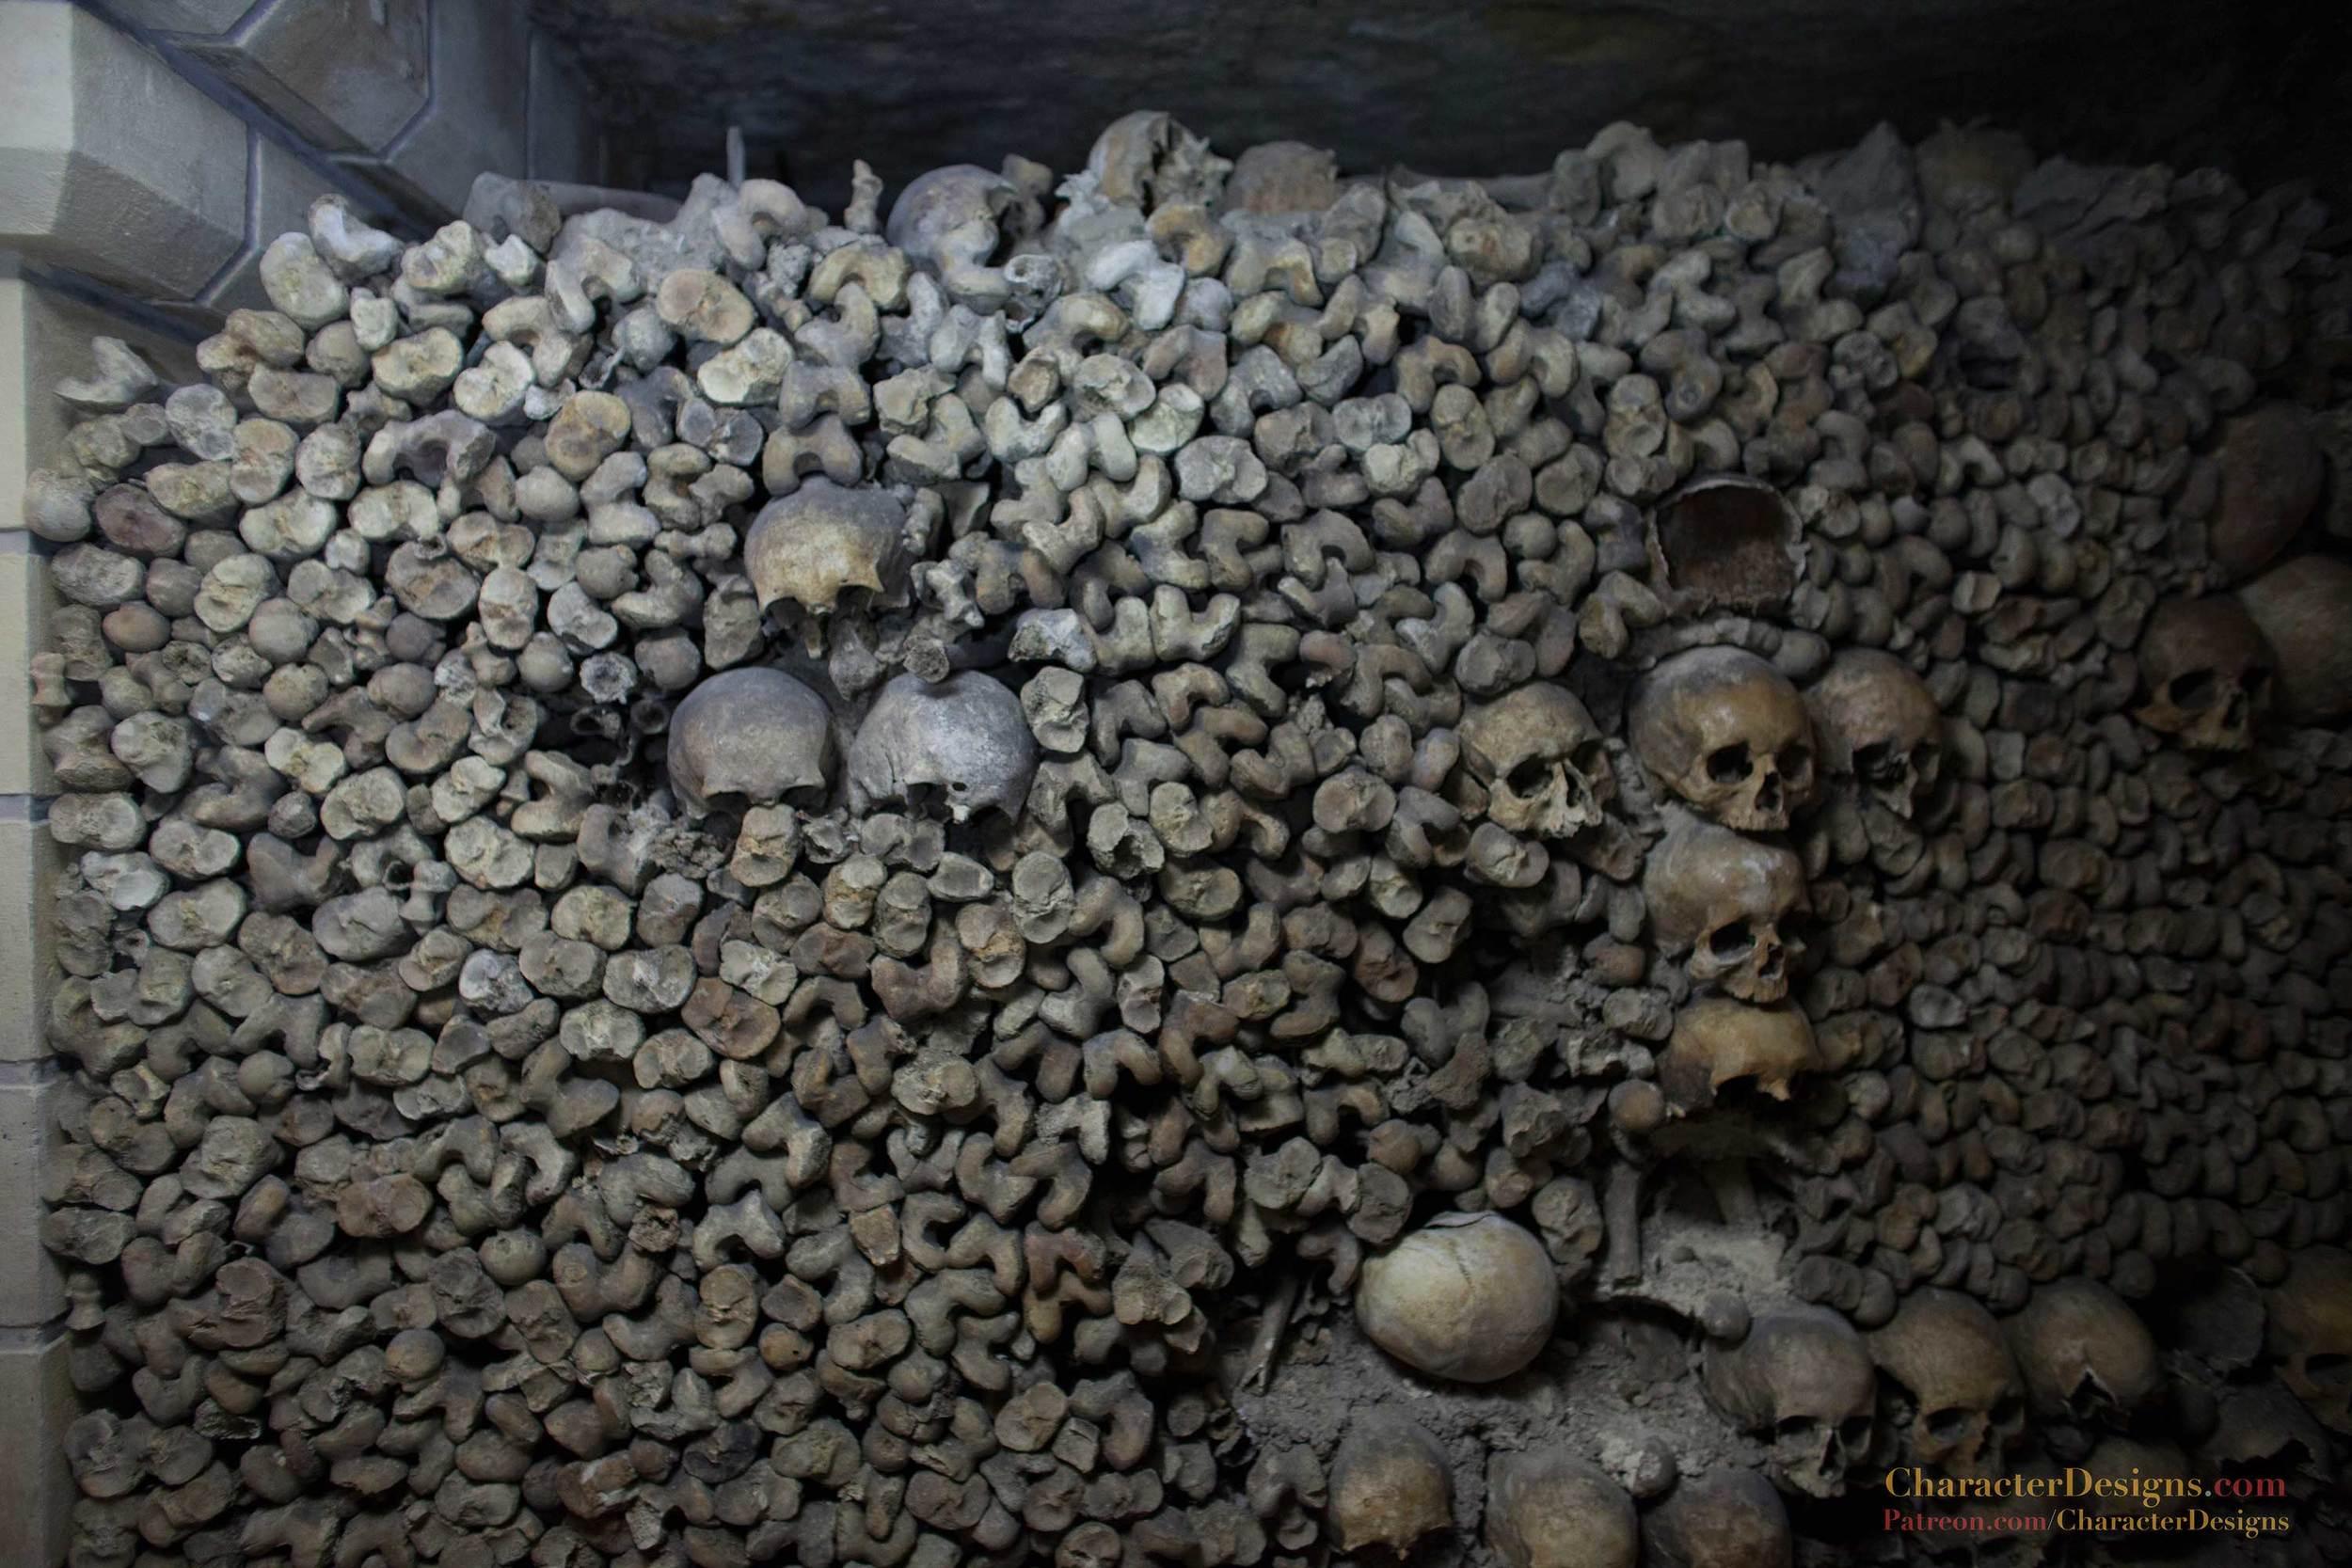 Catacombs_028.jpg